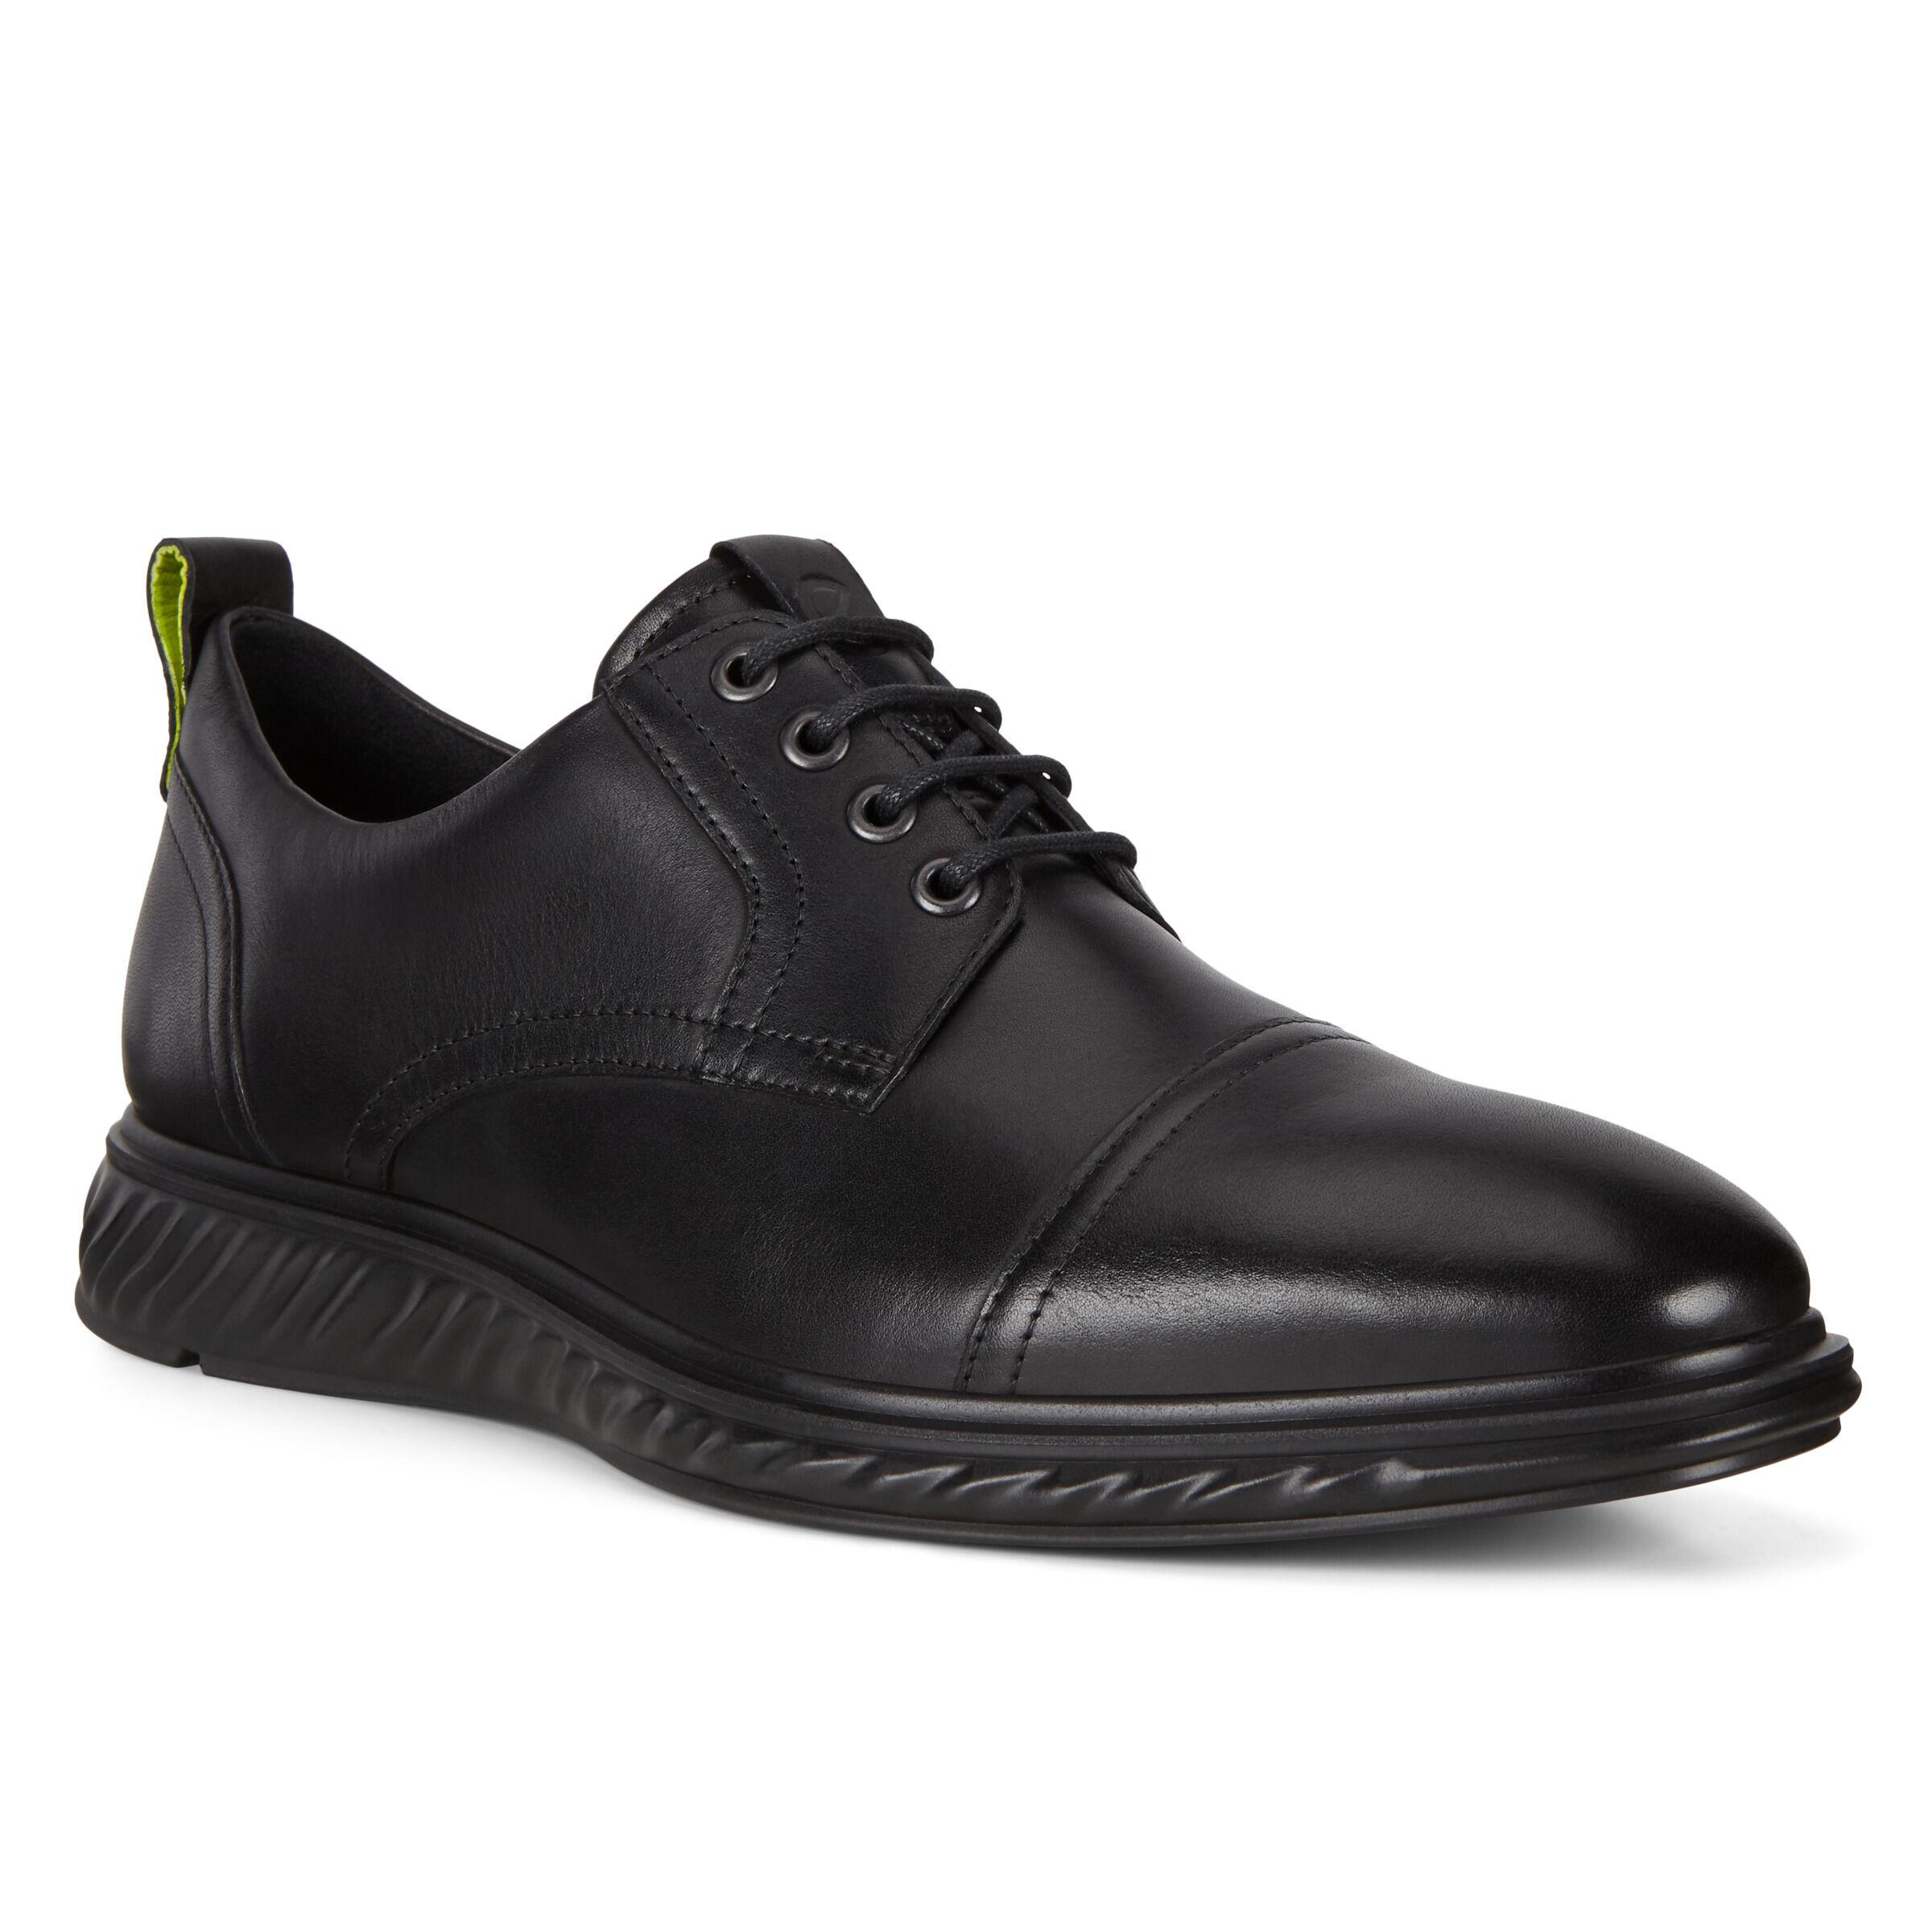 ECCO St. 1 Hybrid Lite Mens Shoes: 7 - Black